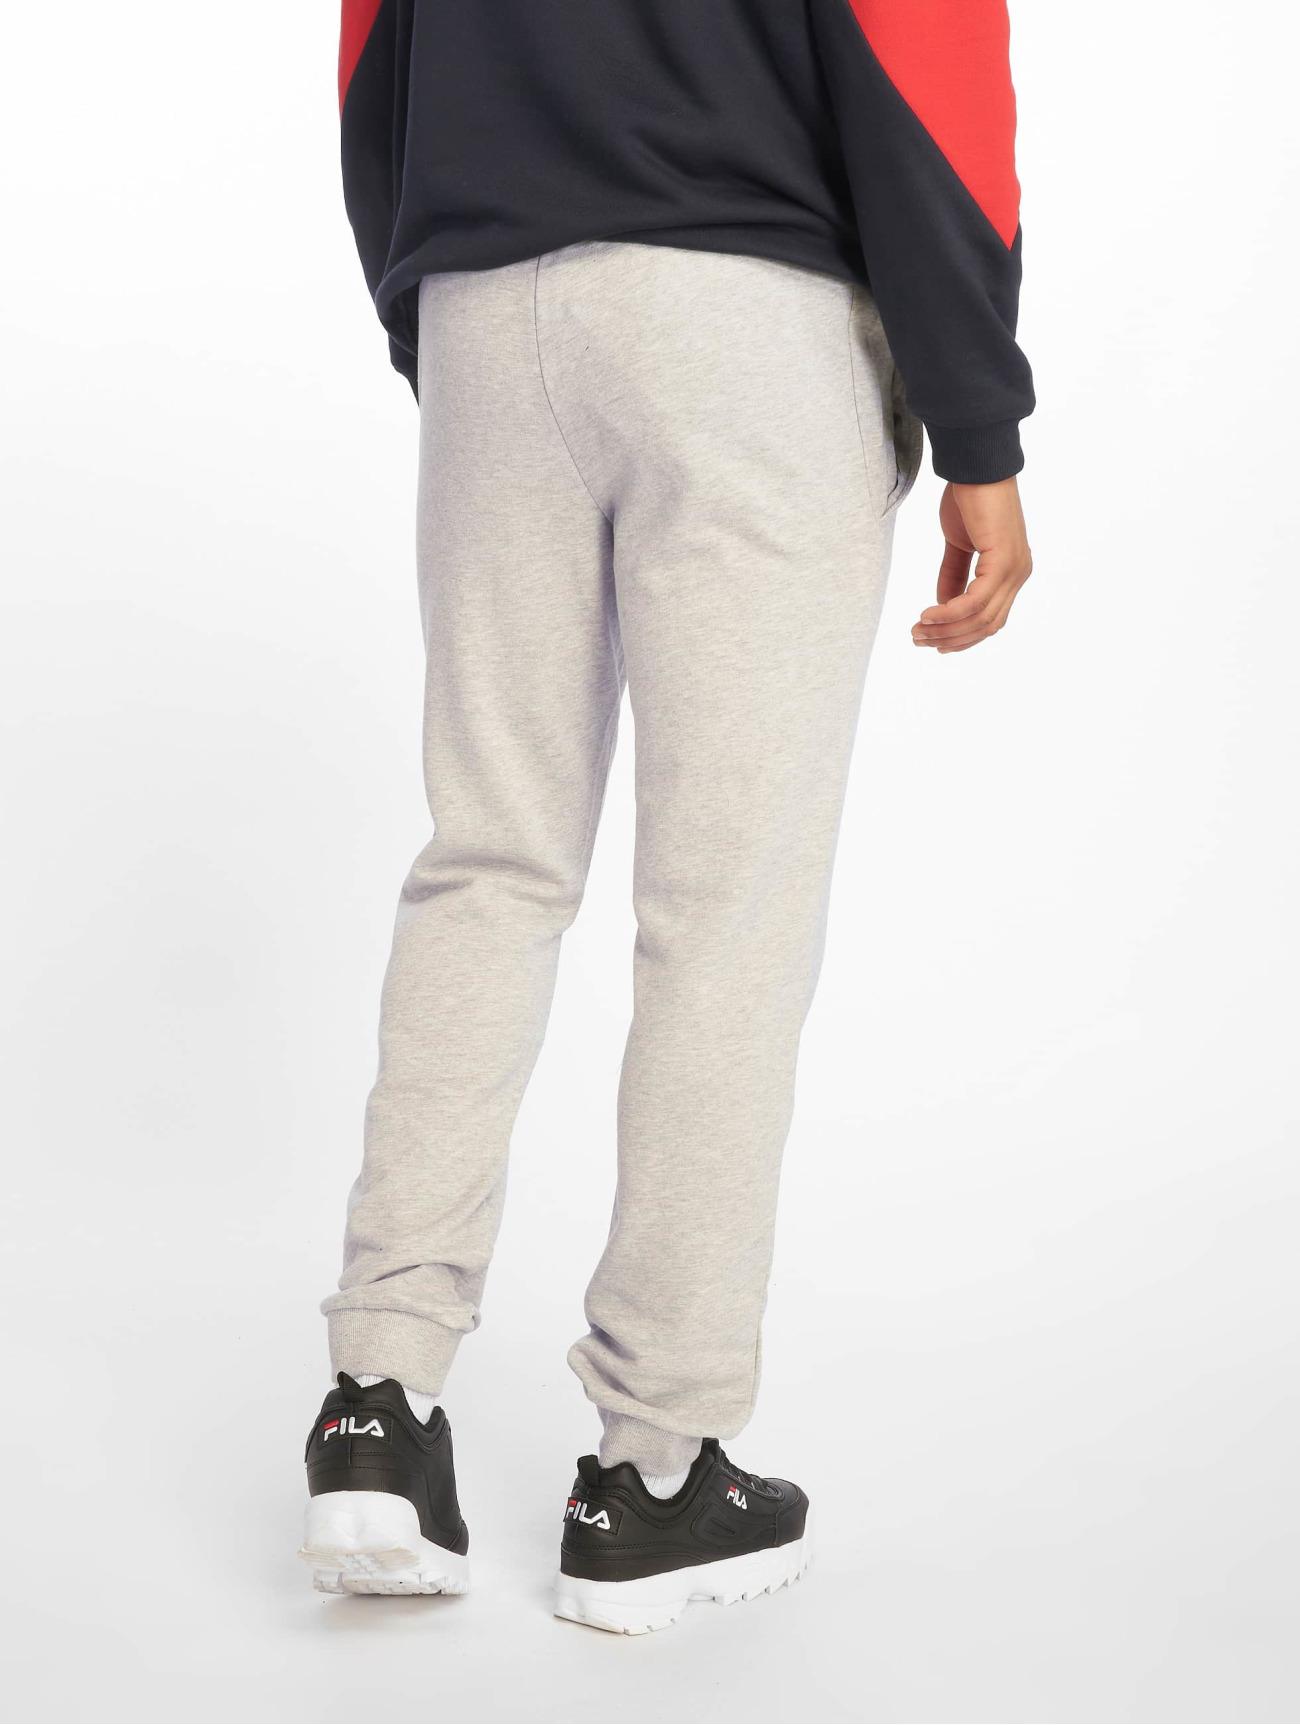 FILA Active  Active Upl Wilmet  gris Homme Jogging  648381 Homme Pantalons & Shorts